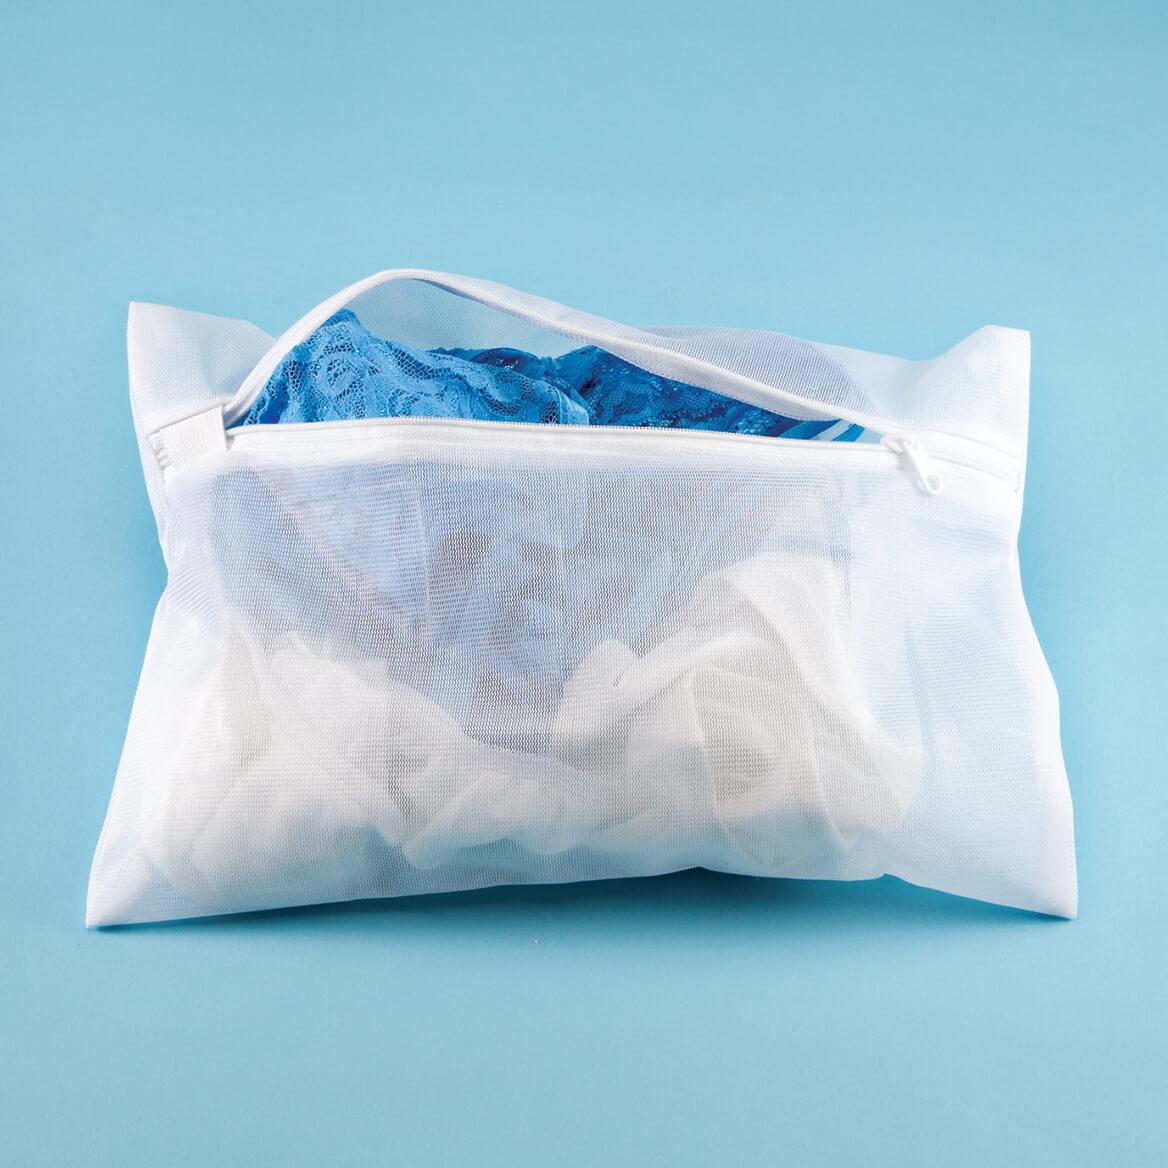 Mesh Laundry Bag-355109